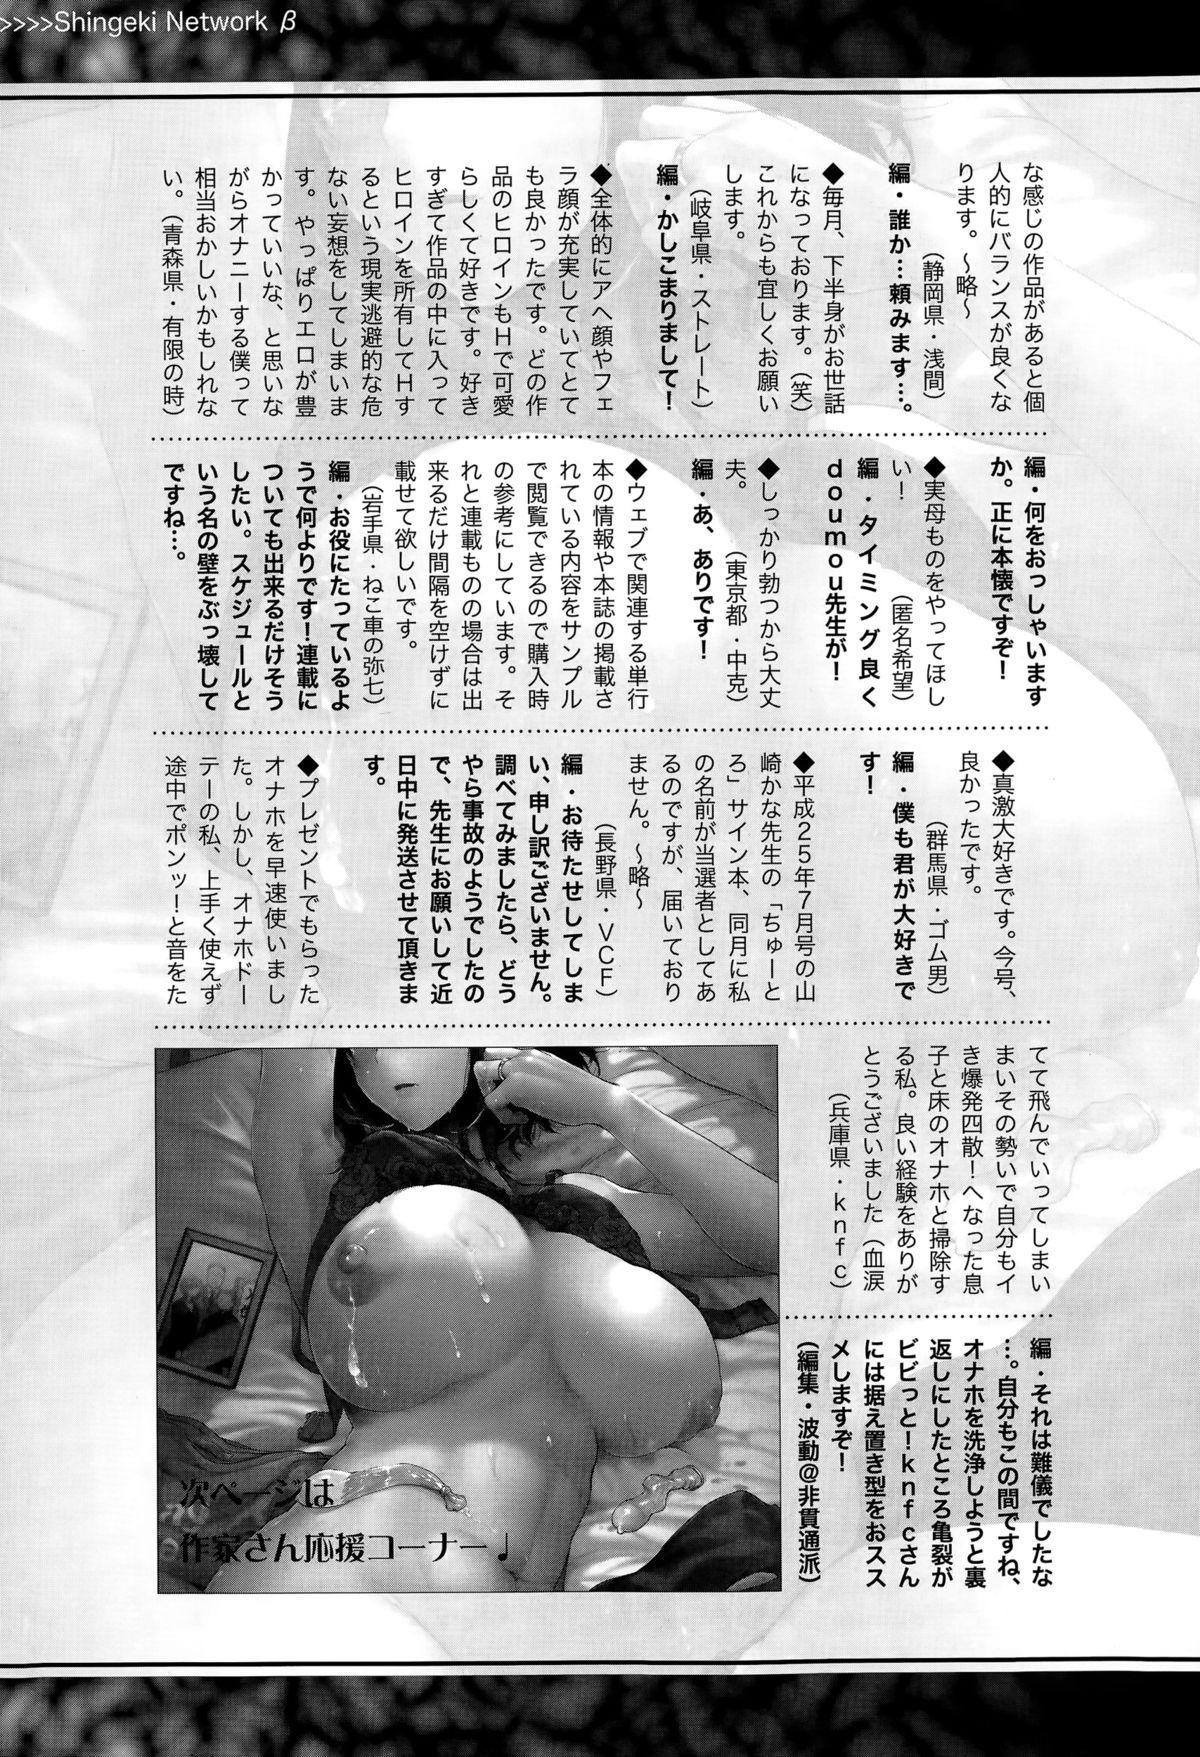 COMIC Shingeki 2015-07 363